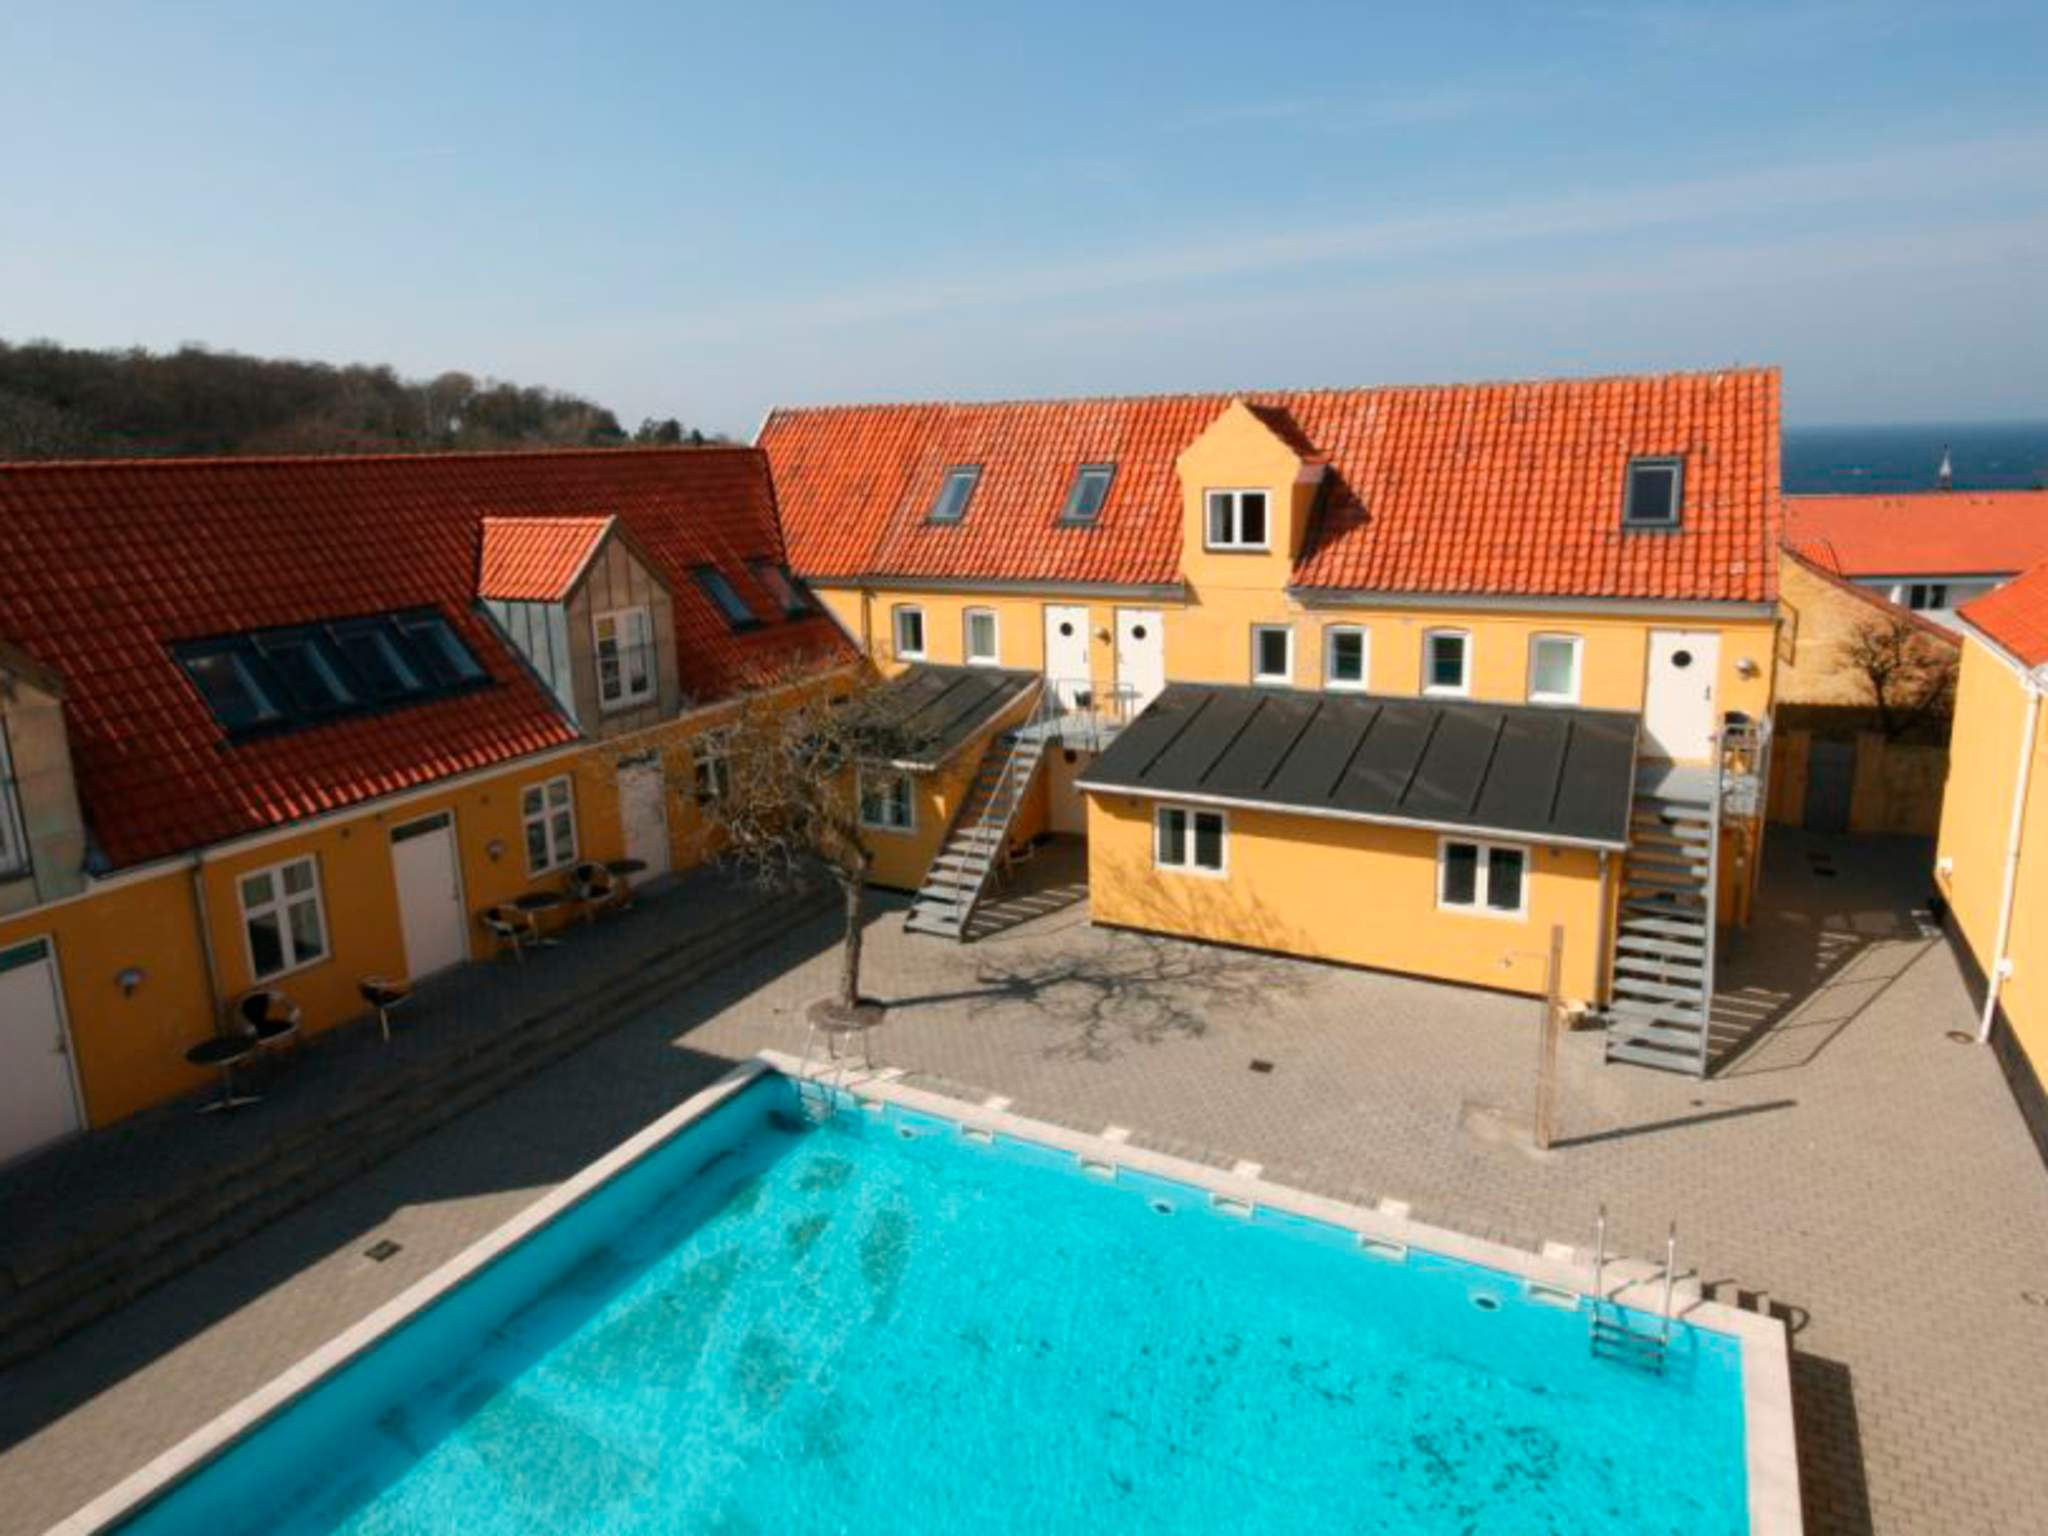 Ferienwohnung Gudhjem (135425), Gudhjem, , Bornholm, Dänemark, Bild 18